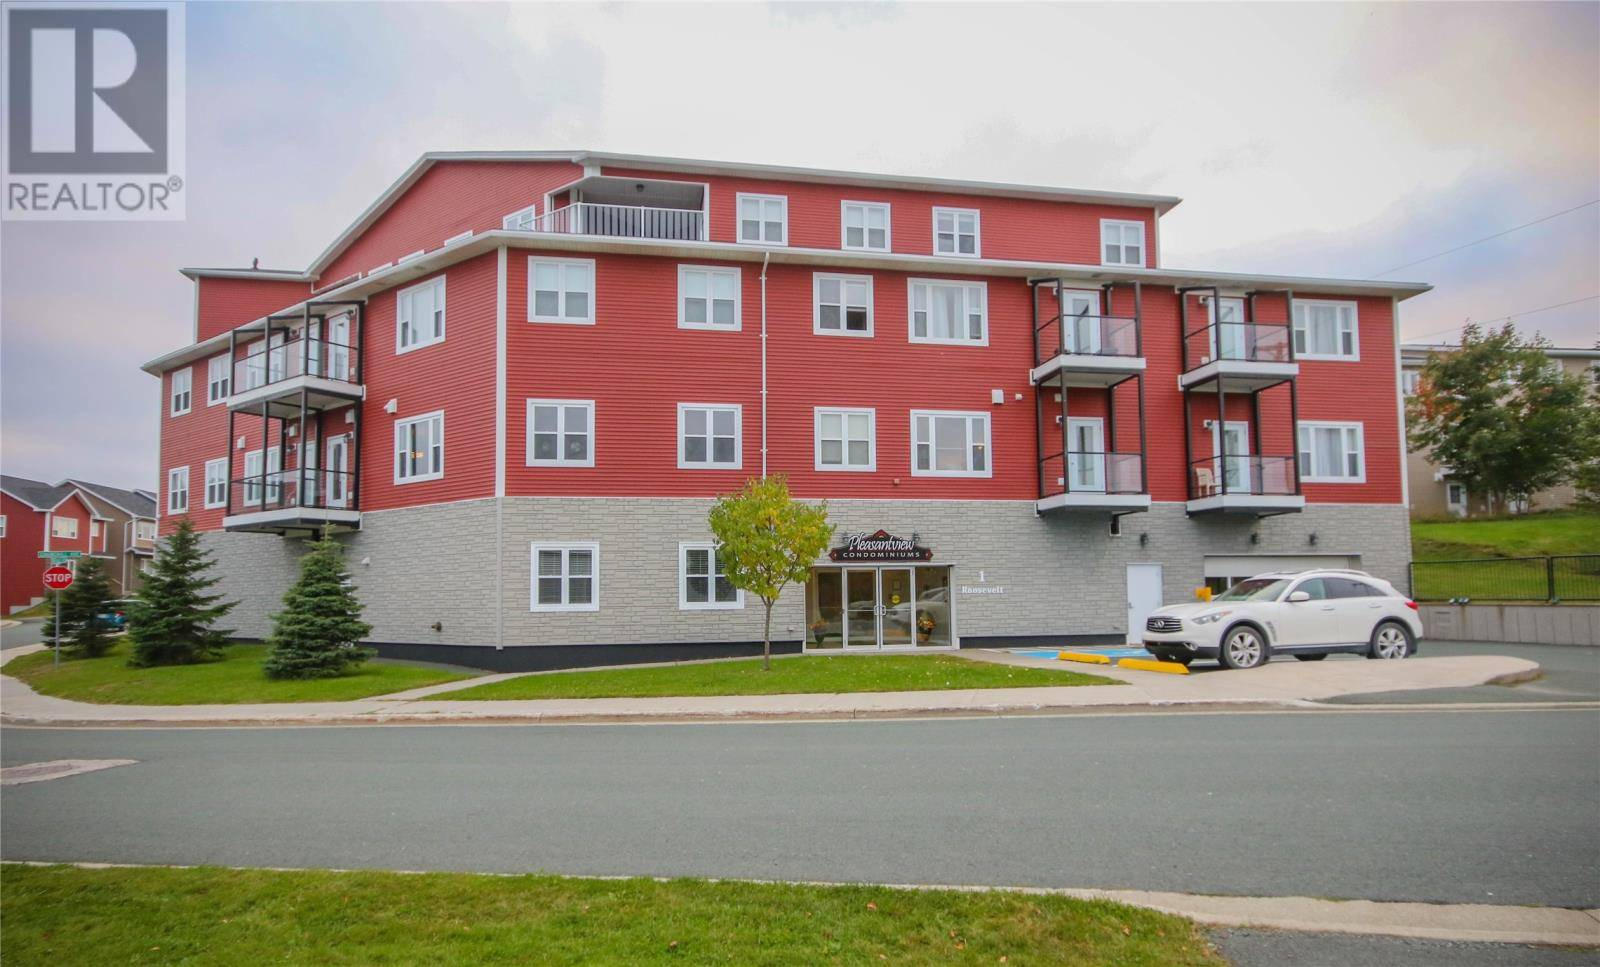 House for sale at 1 Roosevelt Ave Unit 203 St. John's Newfoundland - MLS: 1205305